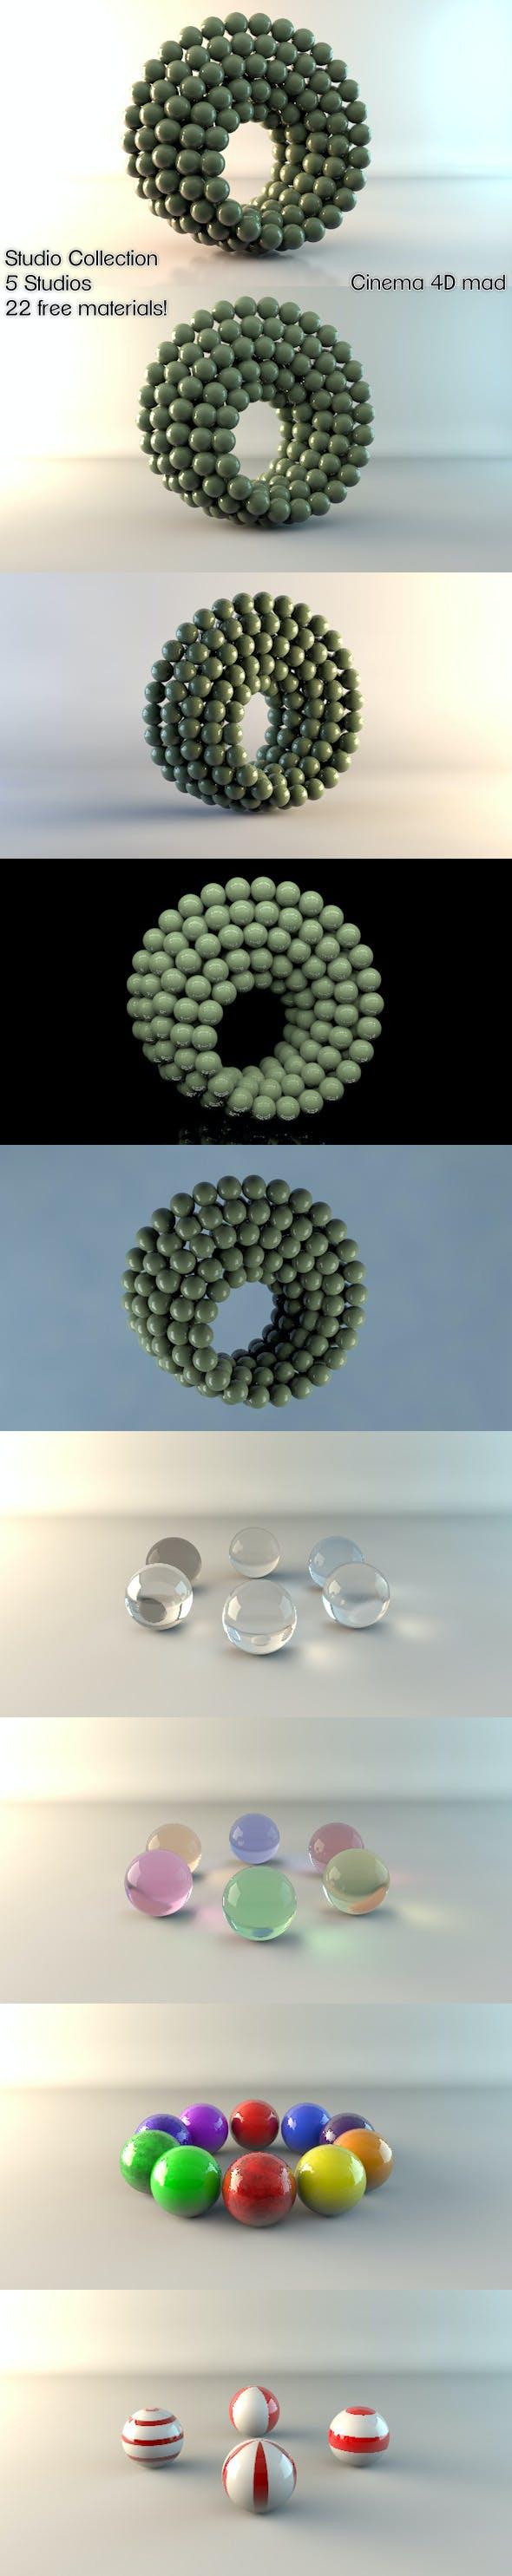 5 Studios & 22 Materials C4D - 3DOcean Item for Sale